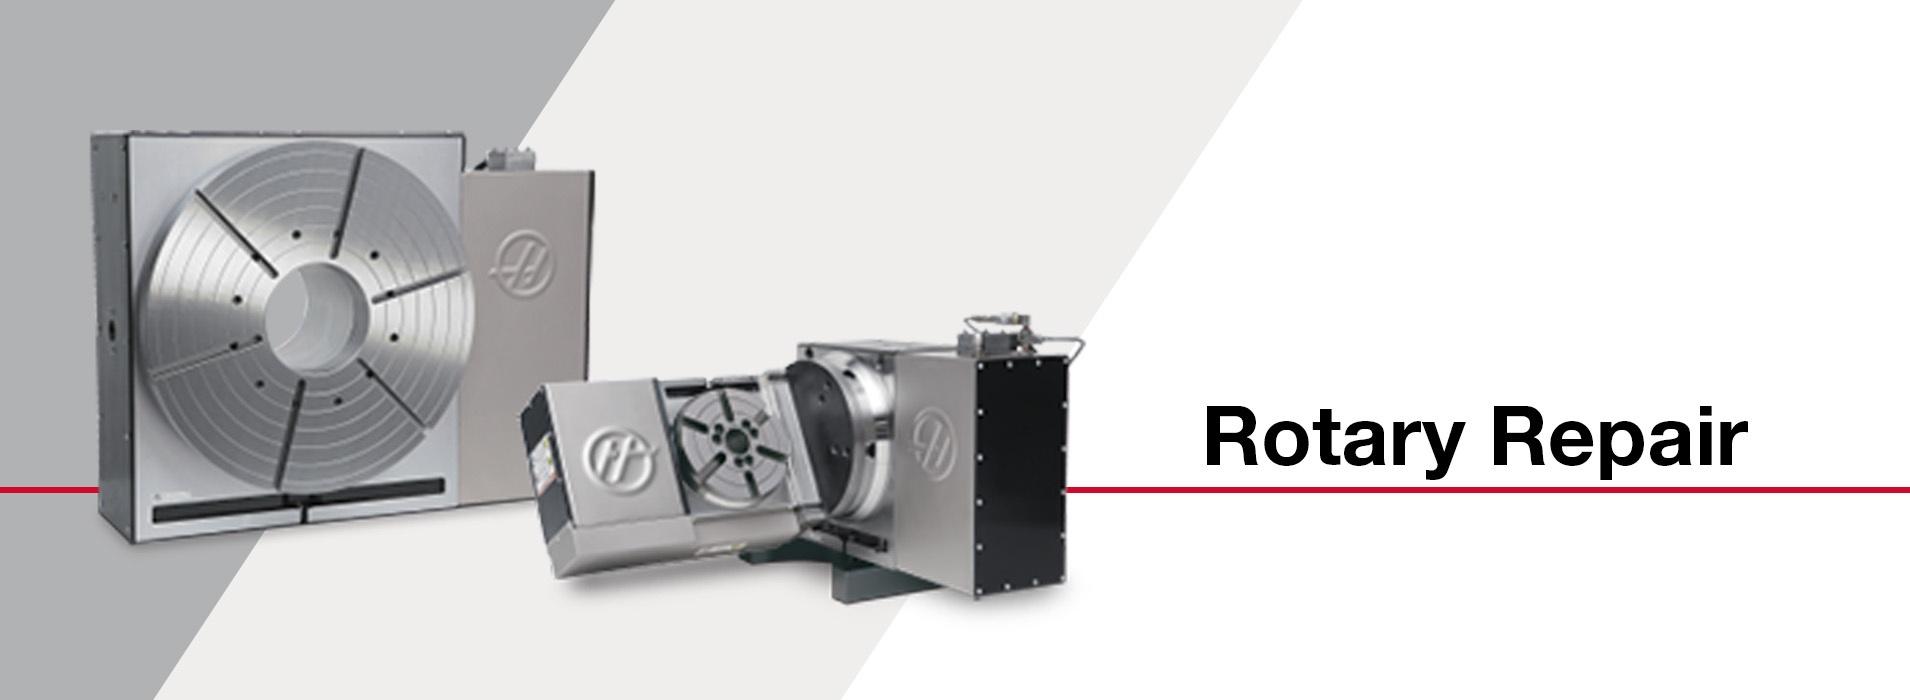 rotaryrepairheader.jpg